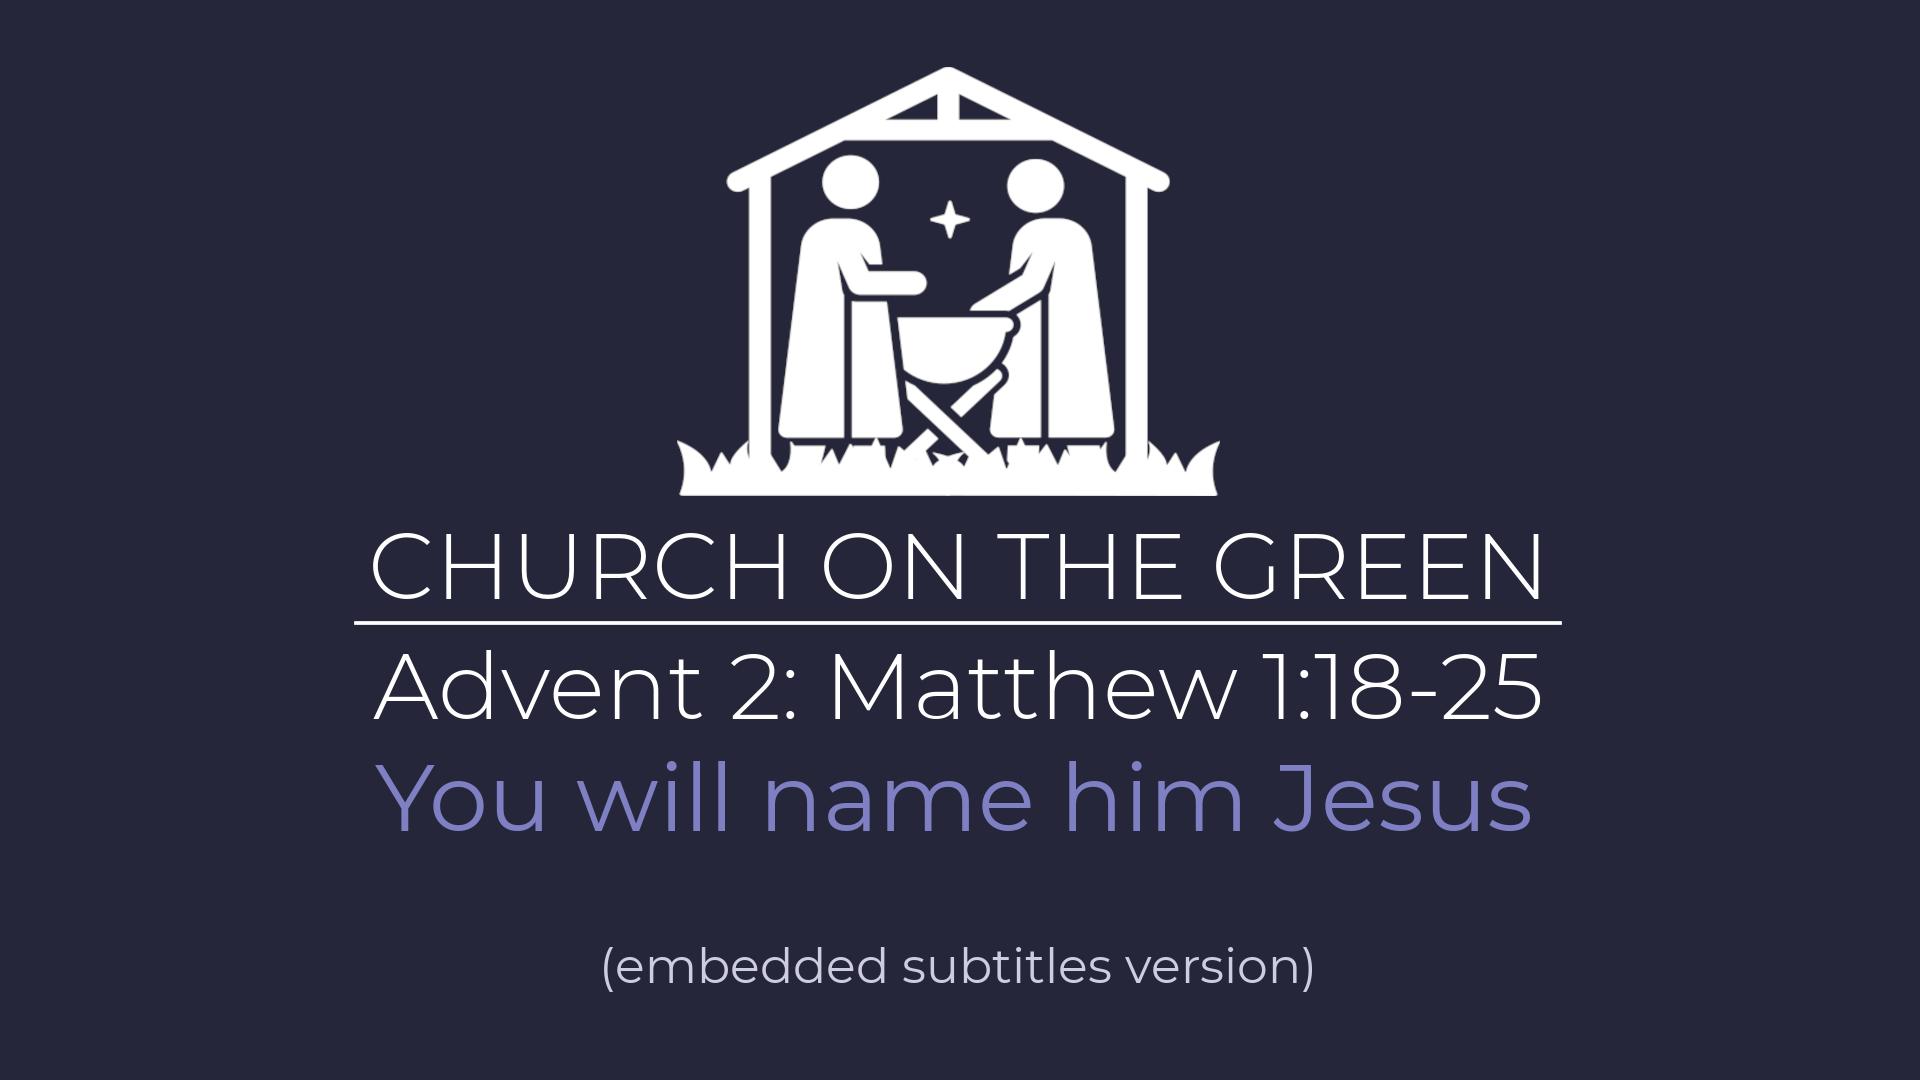 You will name him Jesus (Matthew 1:18-25)